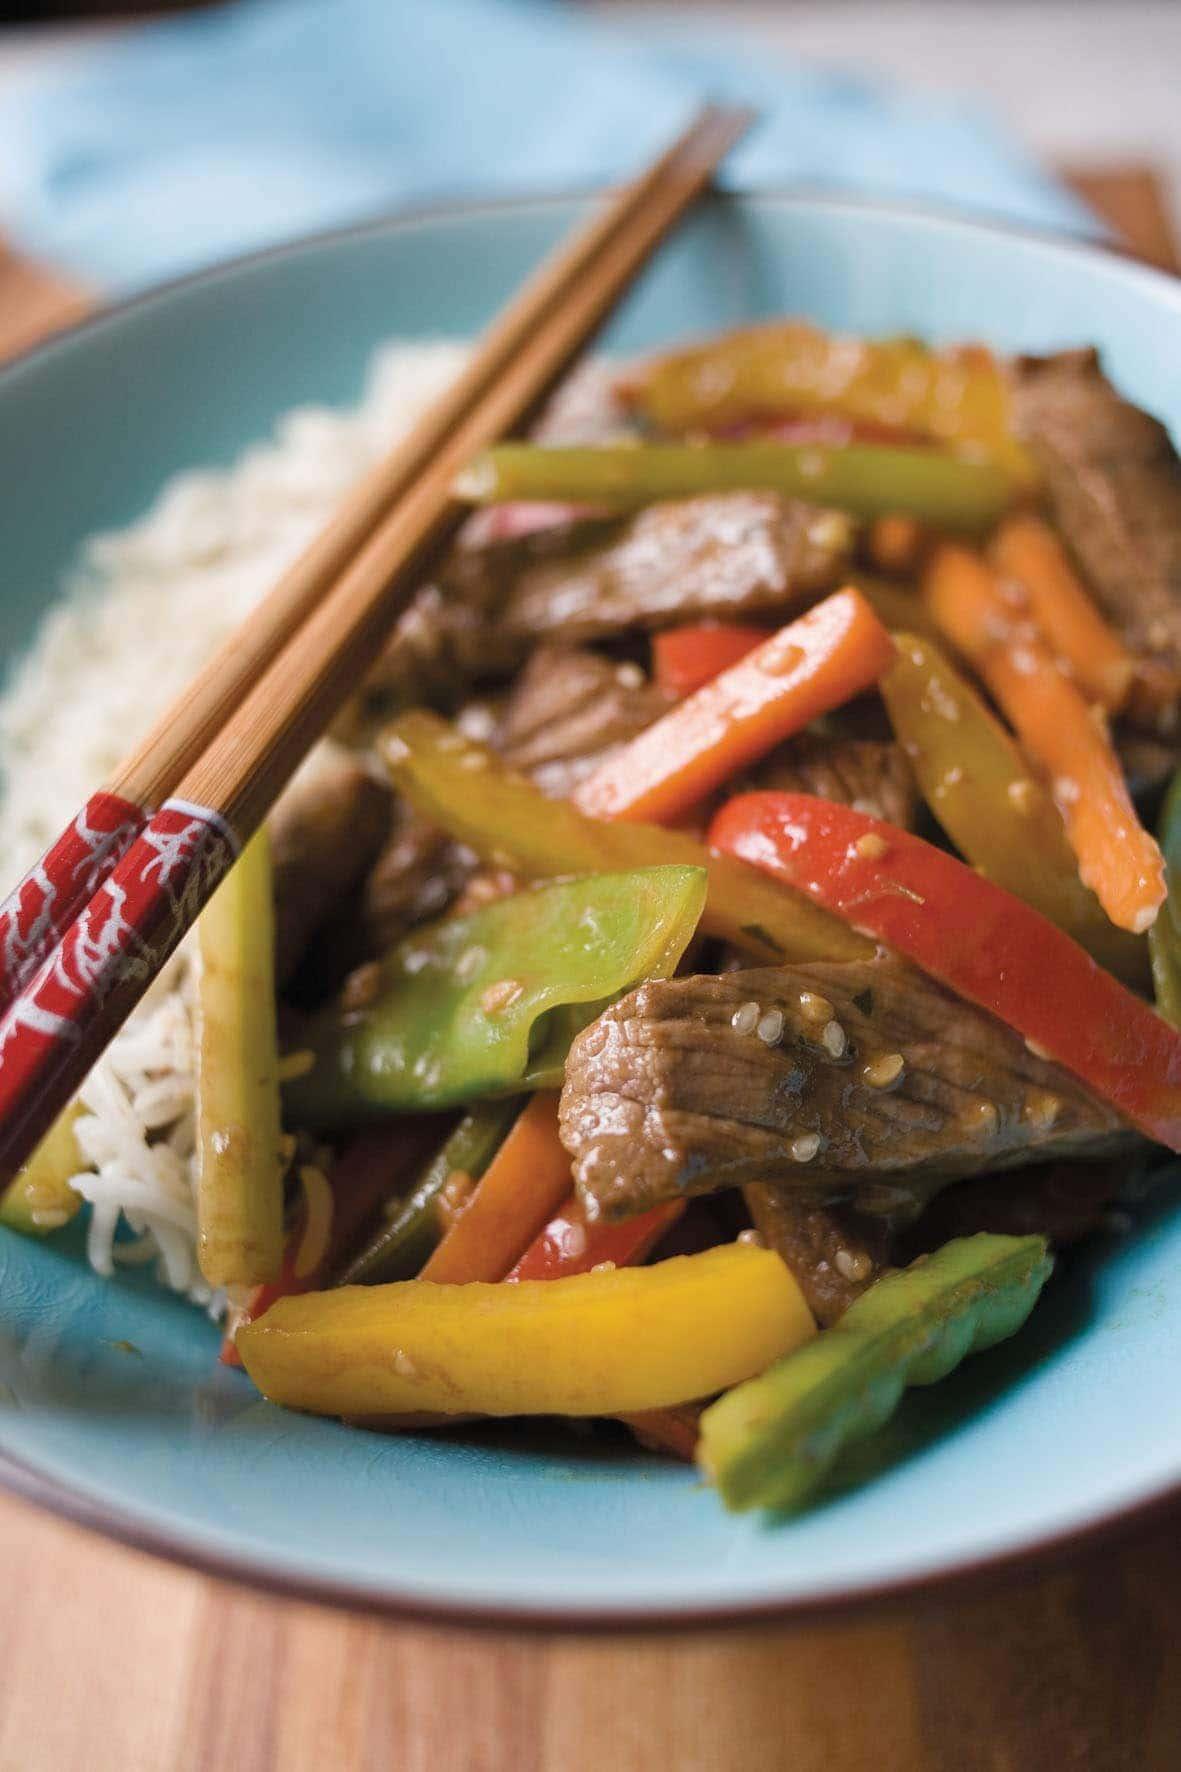 Spicy Beef Stir Fry Healthy Food Guide